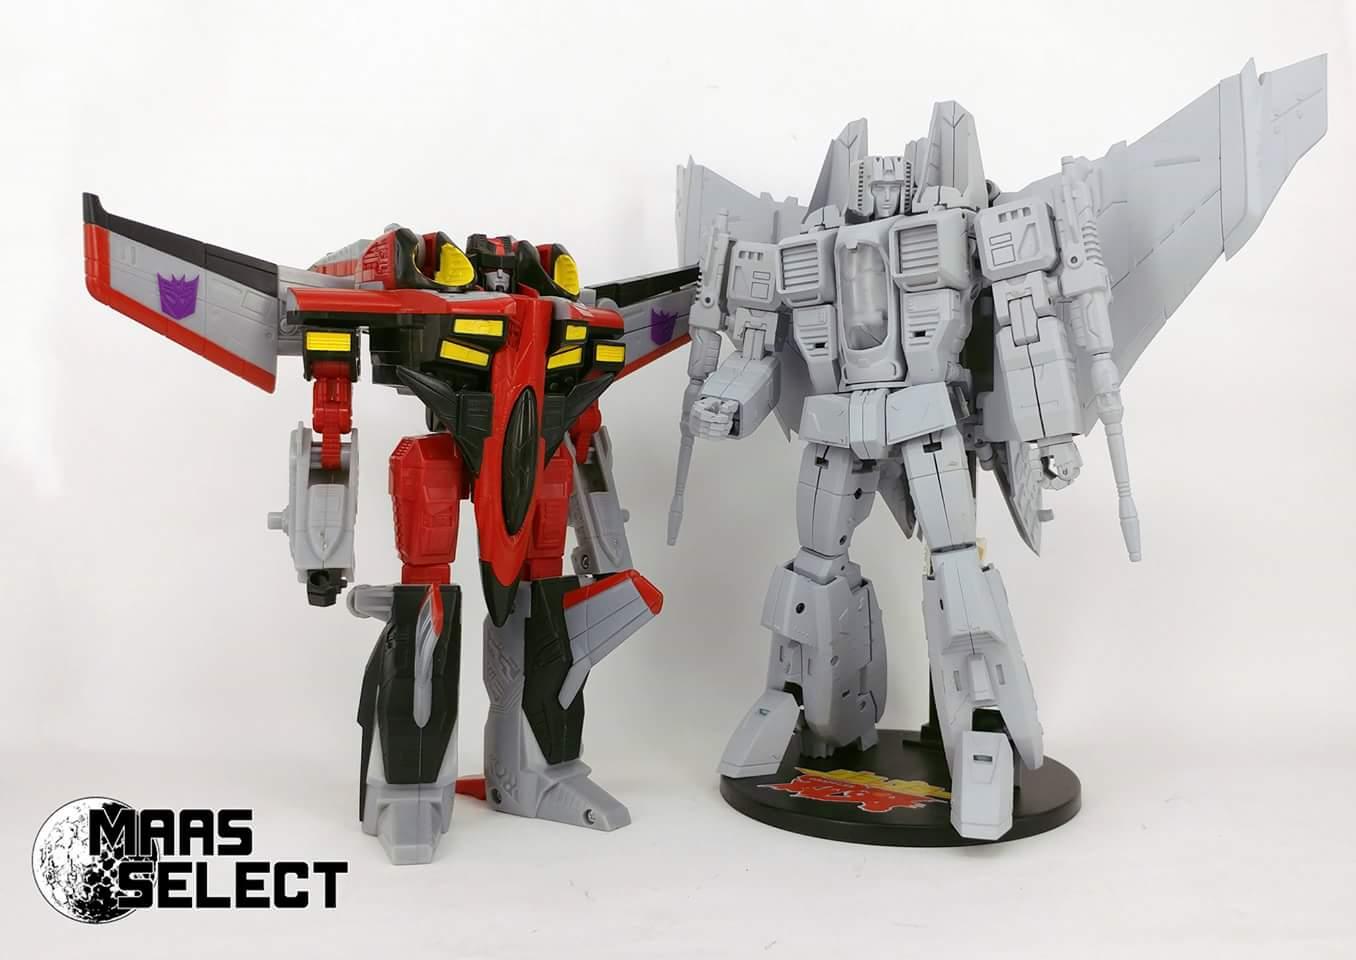 [MAAS Toys] Produit Tiers - Jouets TF de la gamme Cybertech Series (mode Cybertronien) + Gee Too (G2) - Page 2 TrEqG8dj_o